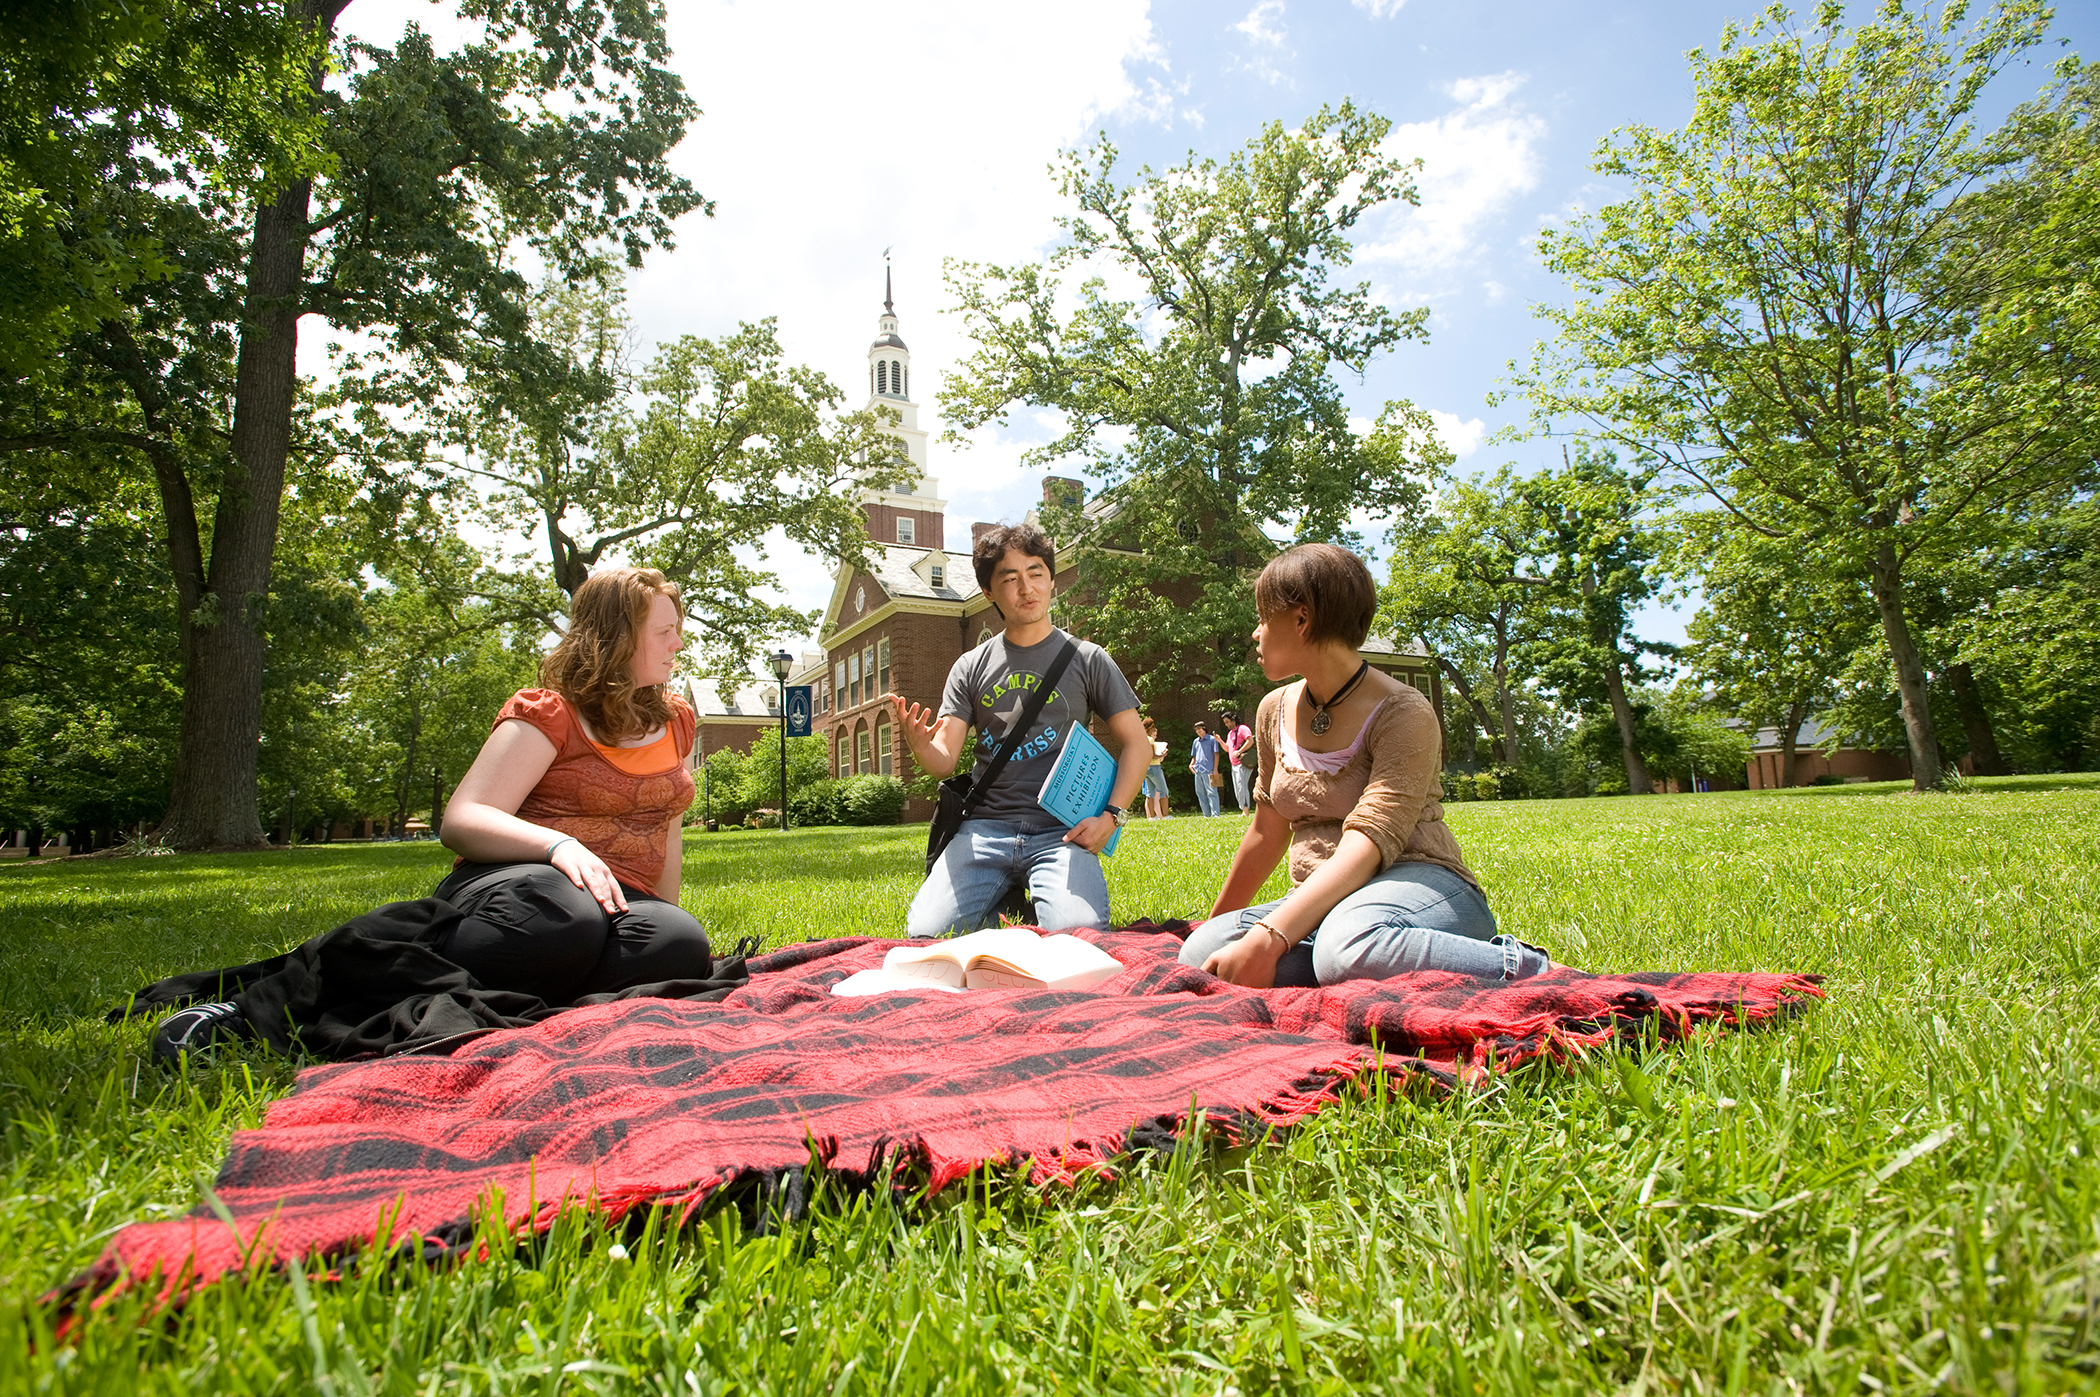 Students Jessica Puckett-Davis, Ahmad Shuja, and Keosha Morgan study outside of Draper on a nice Spring day, Berea College, May 22, 2009.